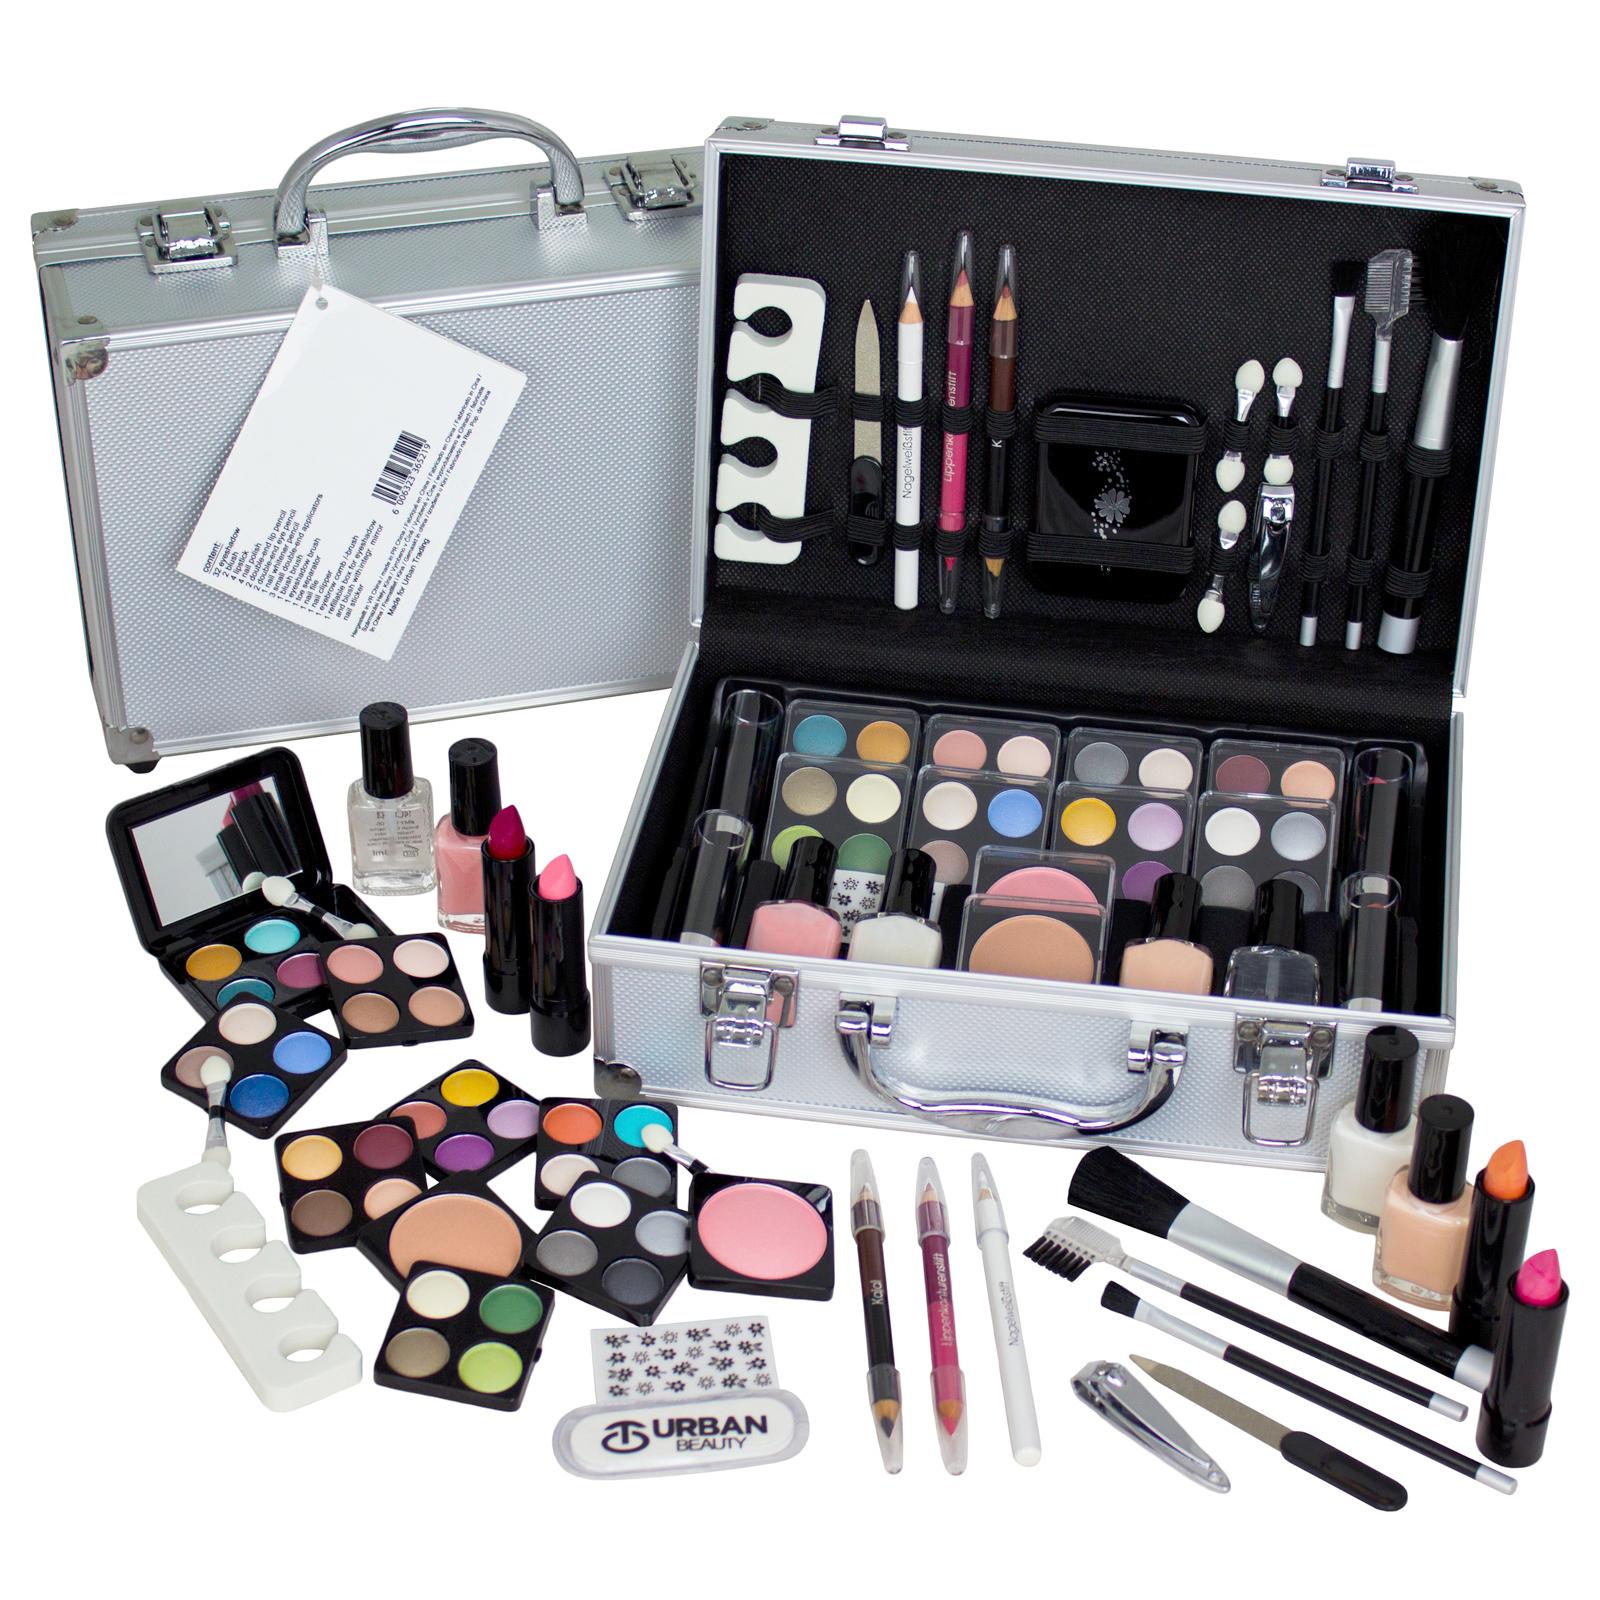 Vanity Case Urban Beauty Cosmetic Set Travel Make Up Box Train Holder 59 Piece | EBay